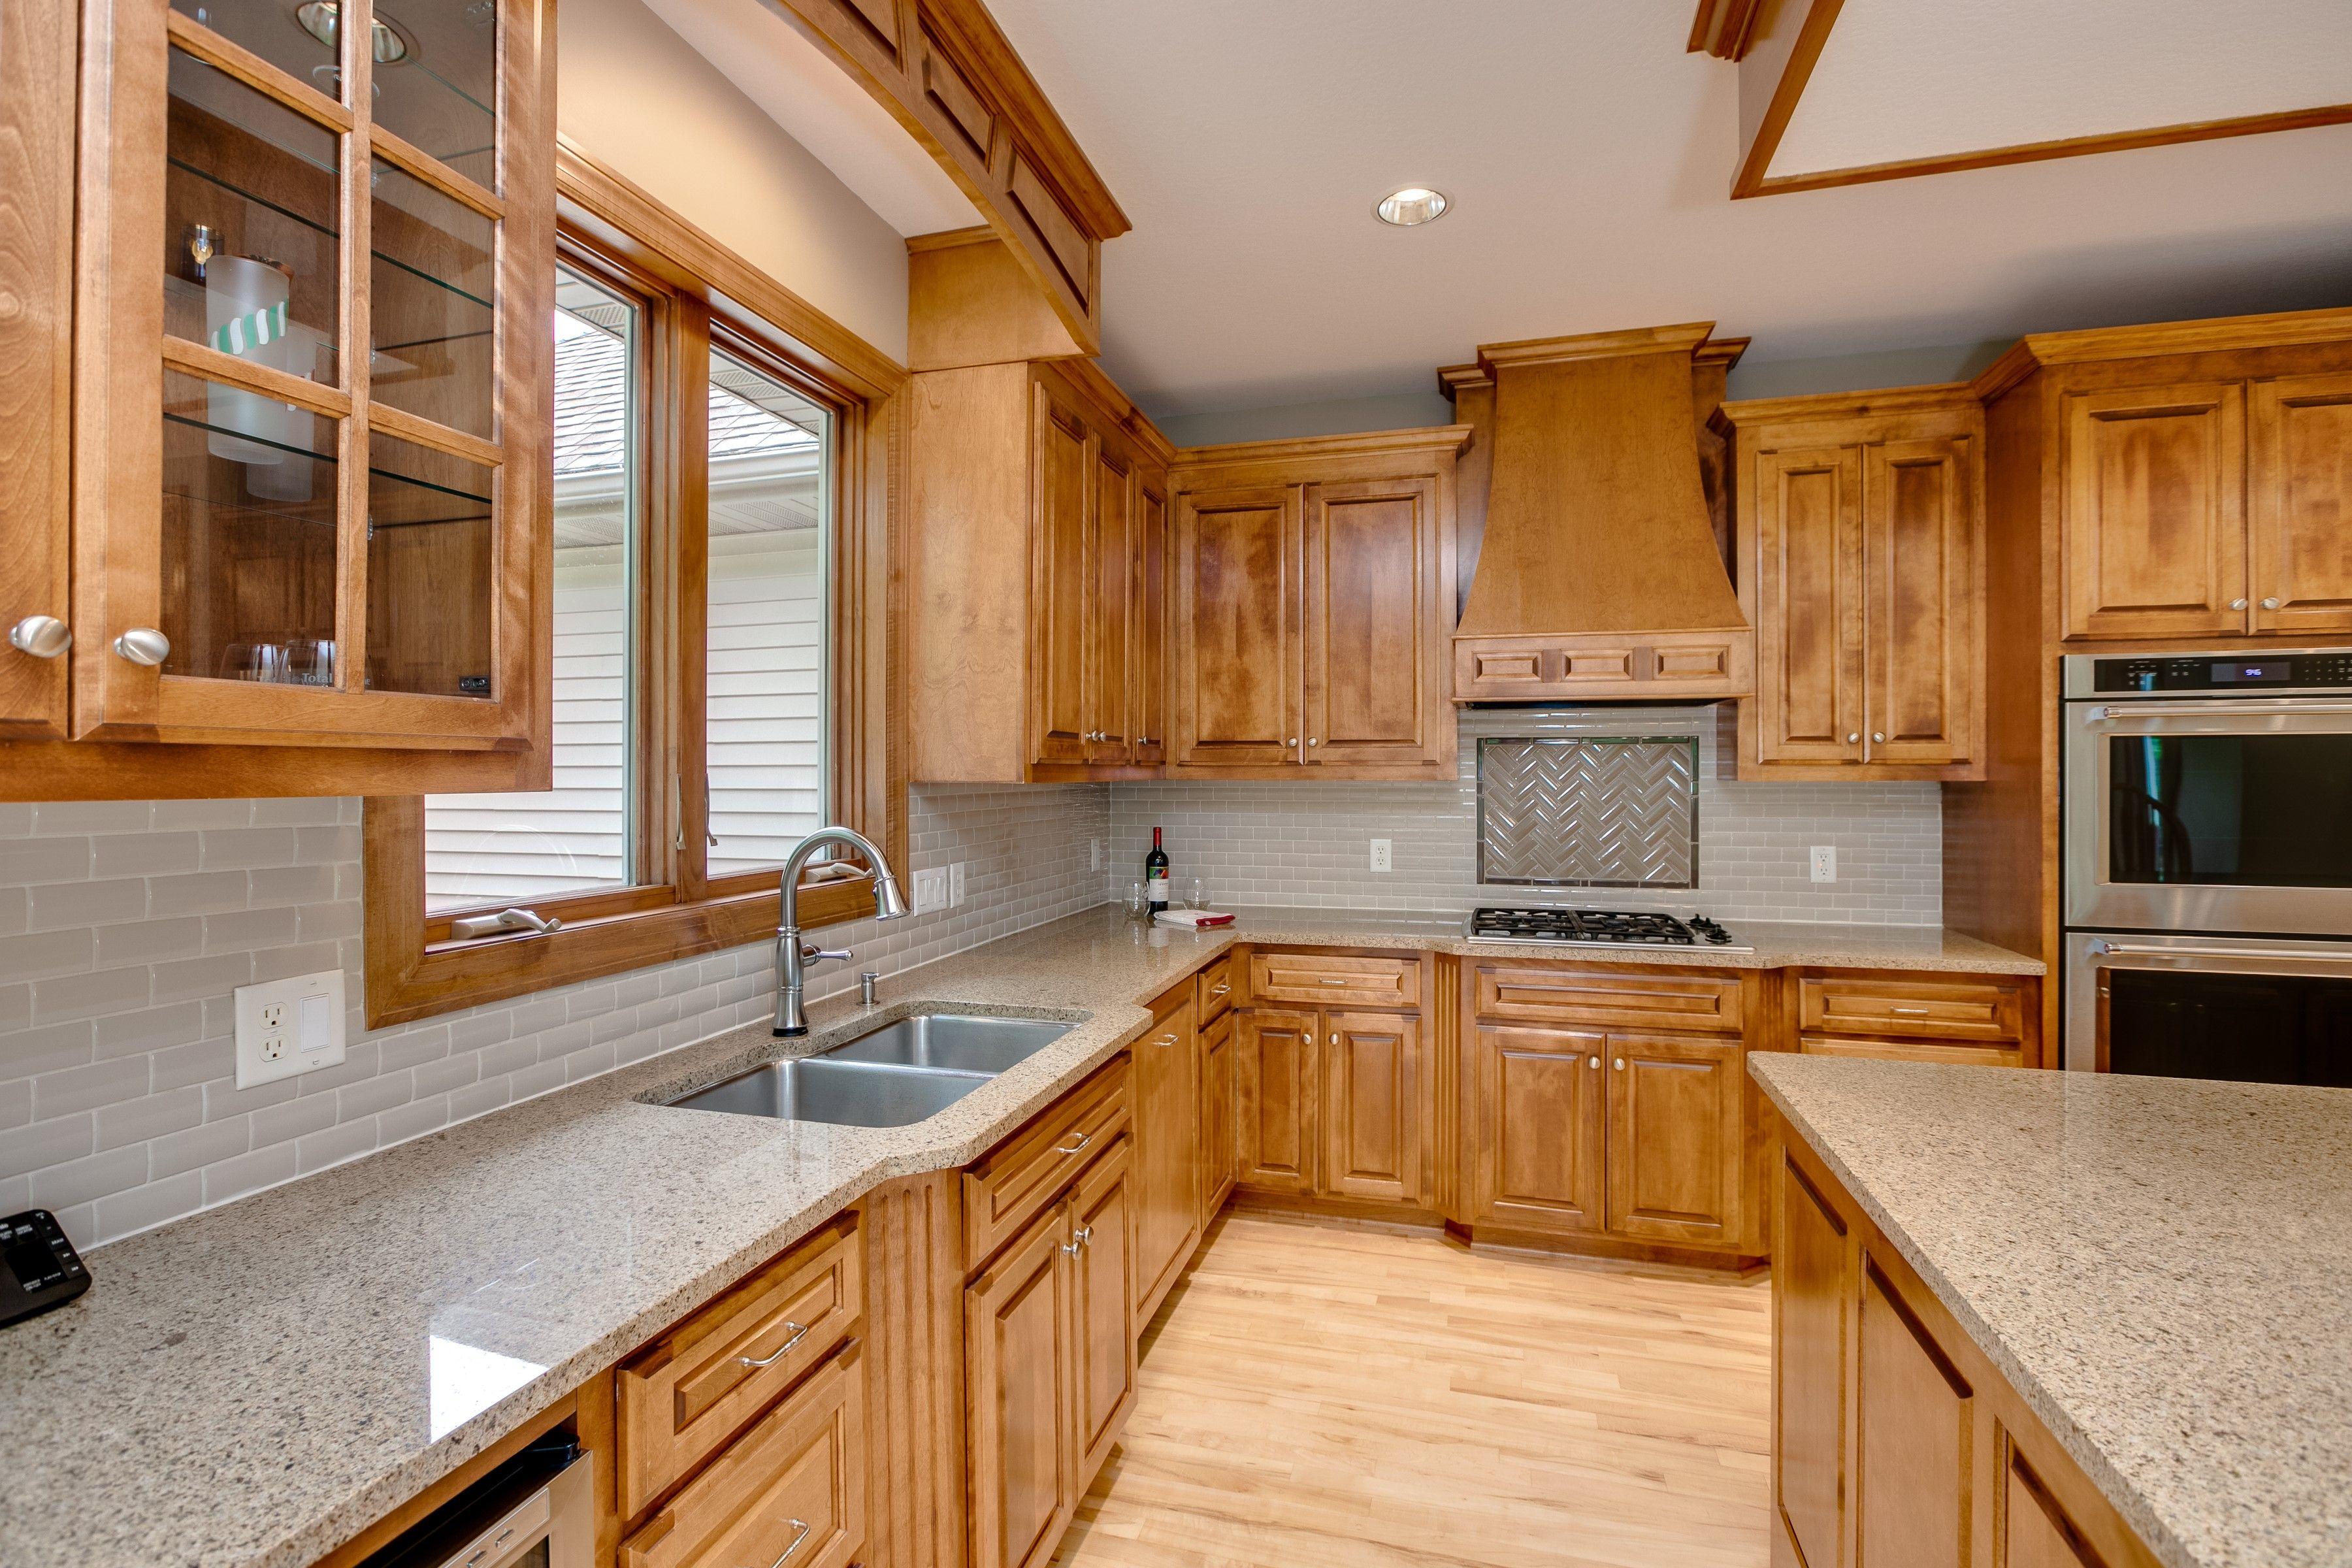 West Savage Real Estate Blog Cool Kitchens Maple Floors Edina Realty